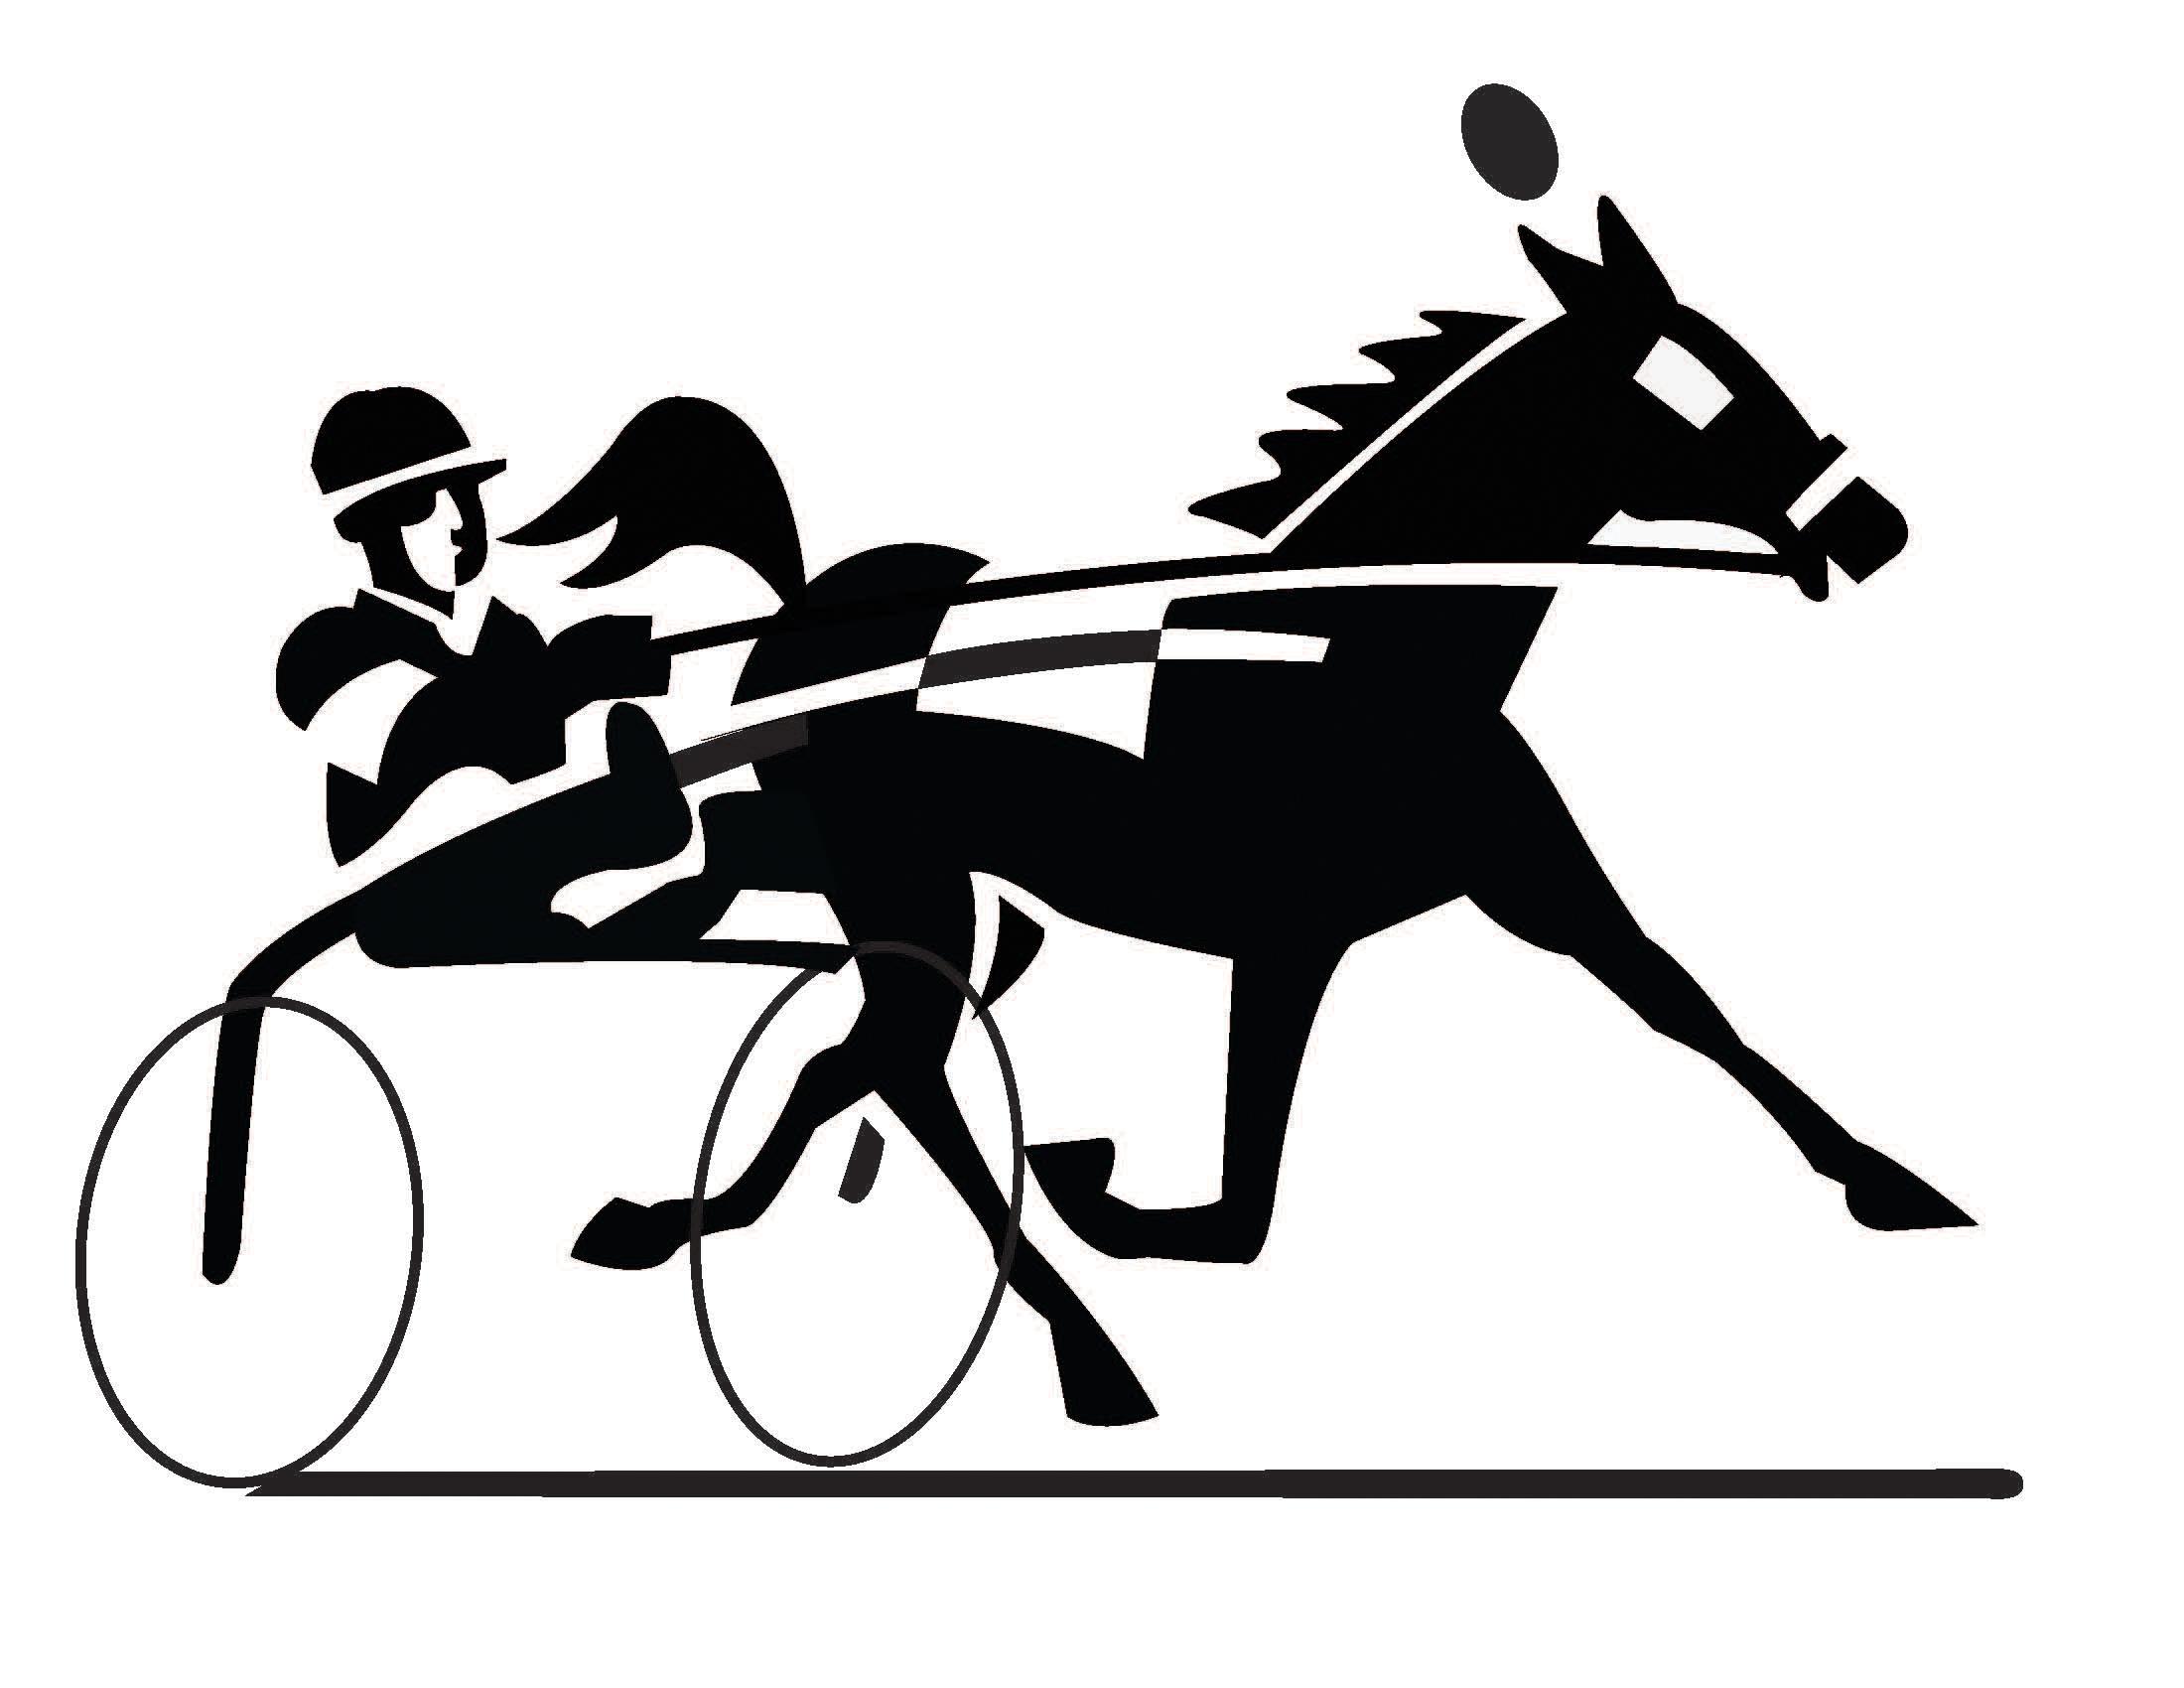 Race clipart animal race. Harness racing